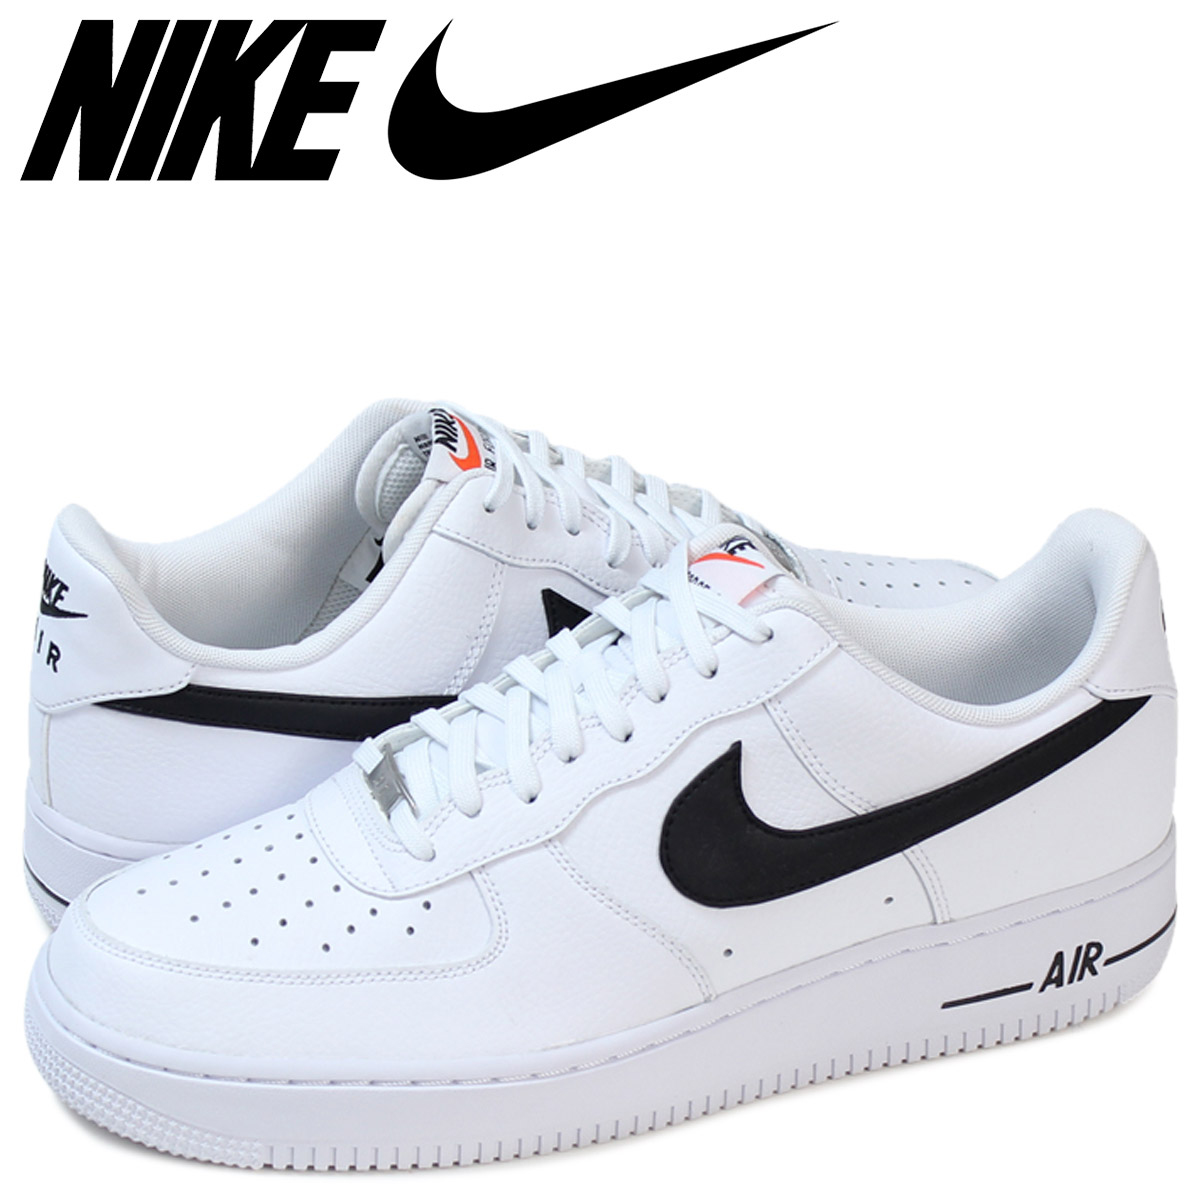 c129fc6d1 NIKE Nike air force sneakers AIR FORCE 1 07 488,298-158 white white men ...